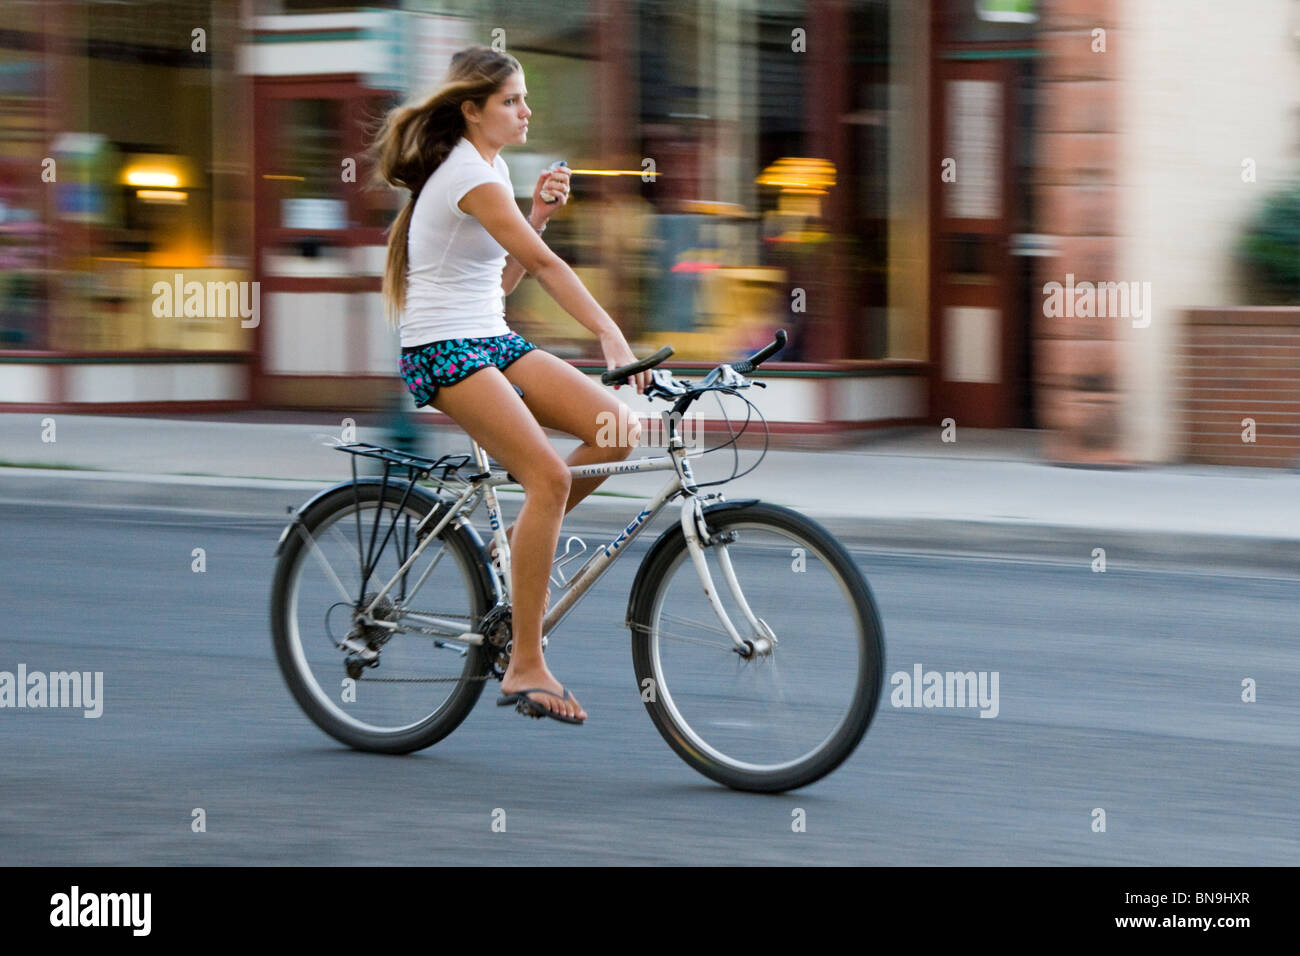 riding bike Girl